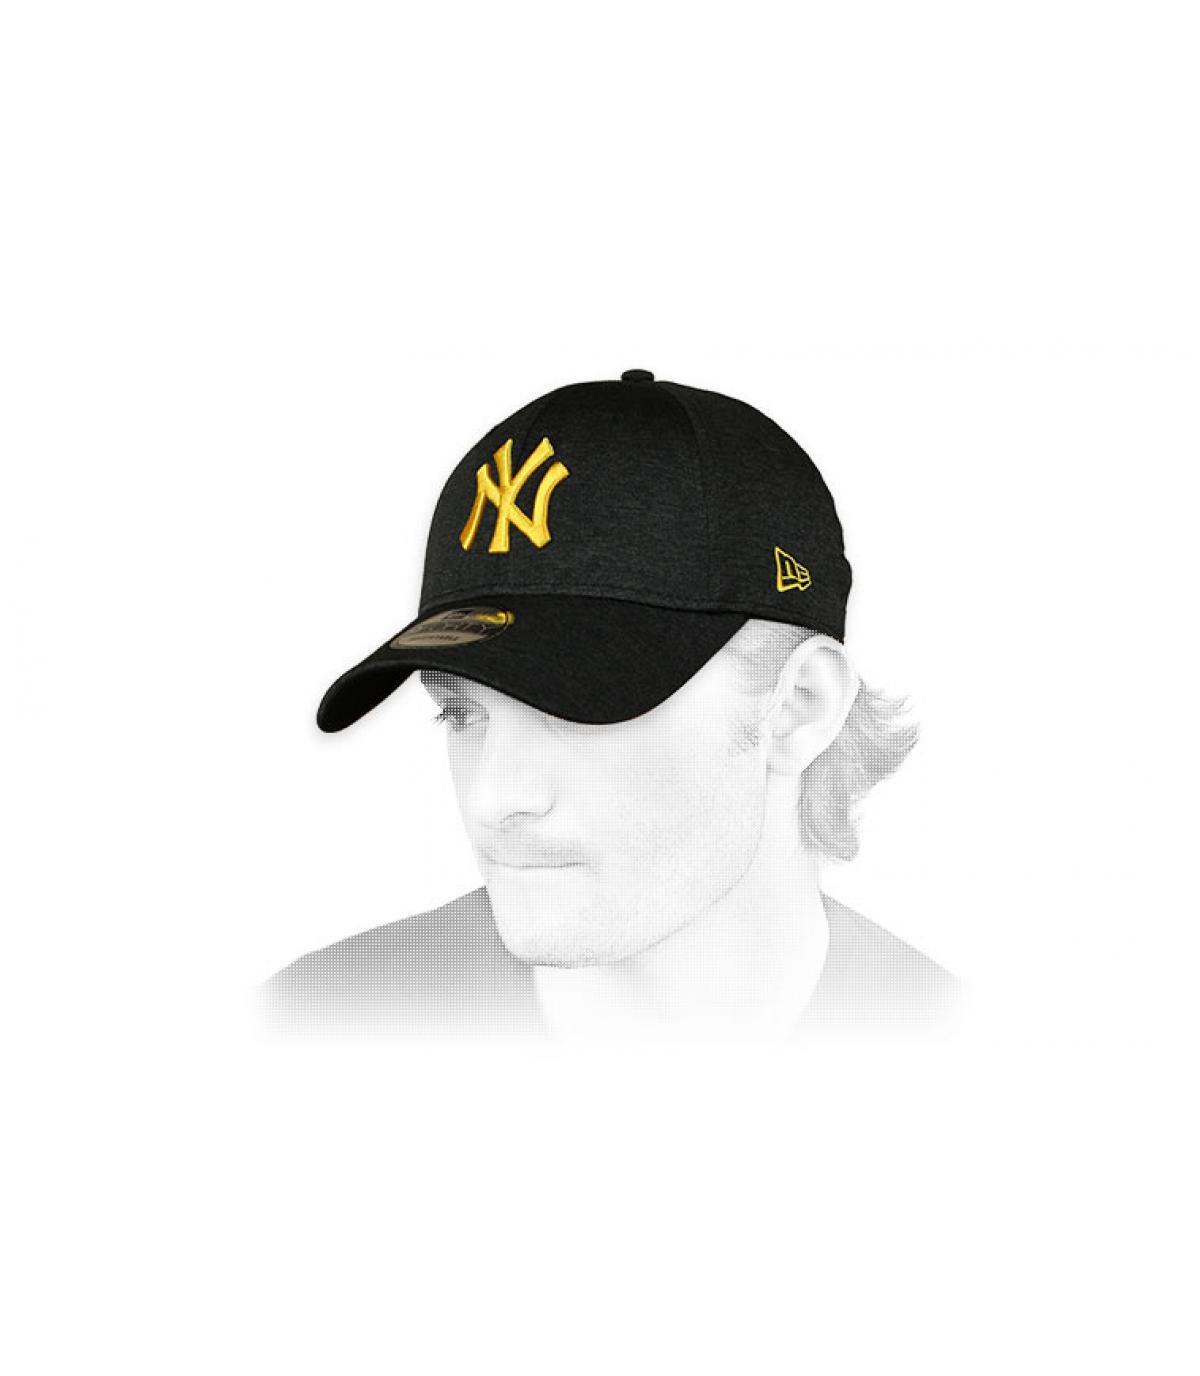 Cap NY schwarz gelb